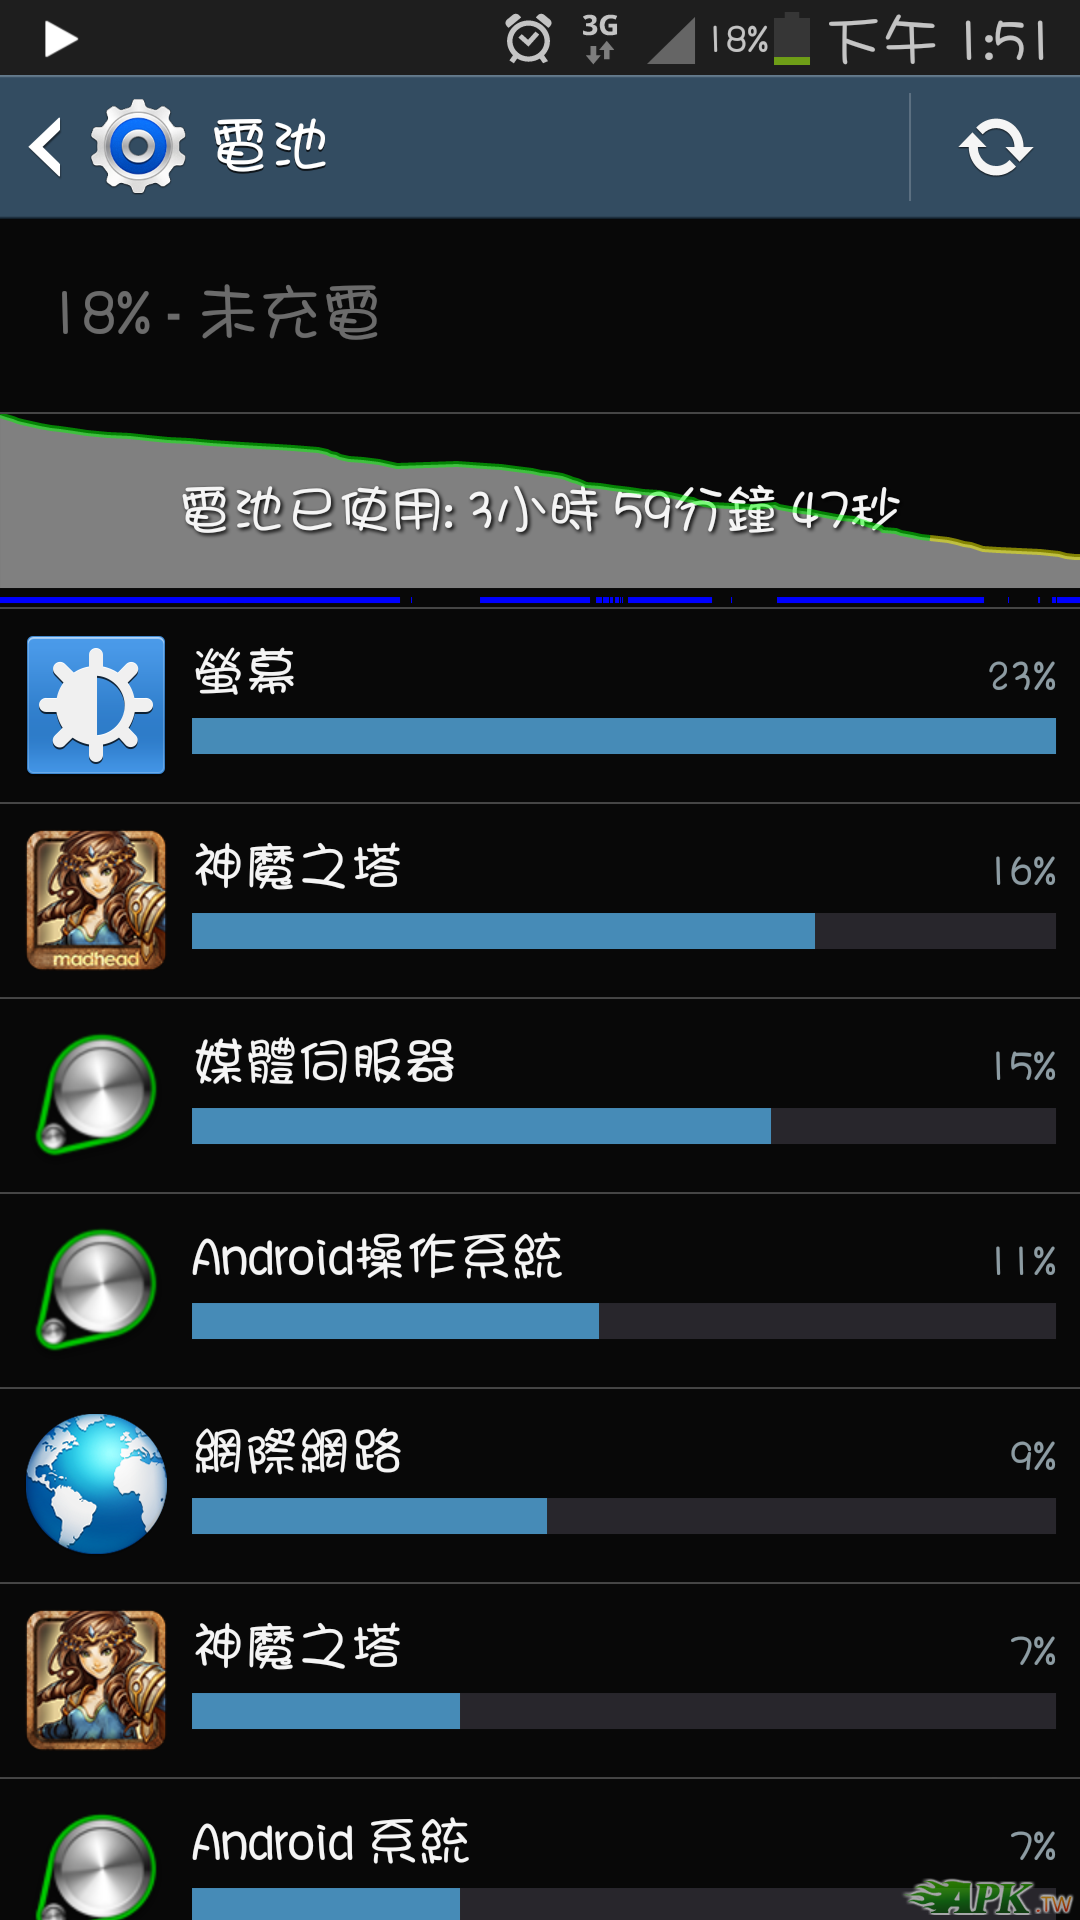 Screenshot_2014-01-25-13-51-05.png